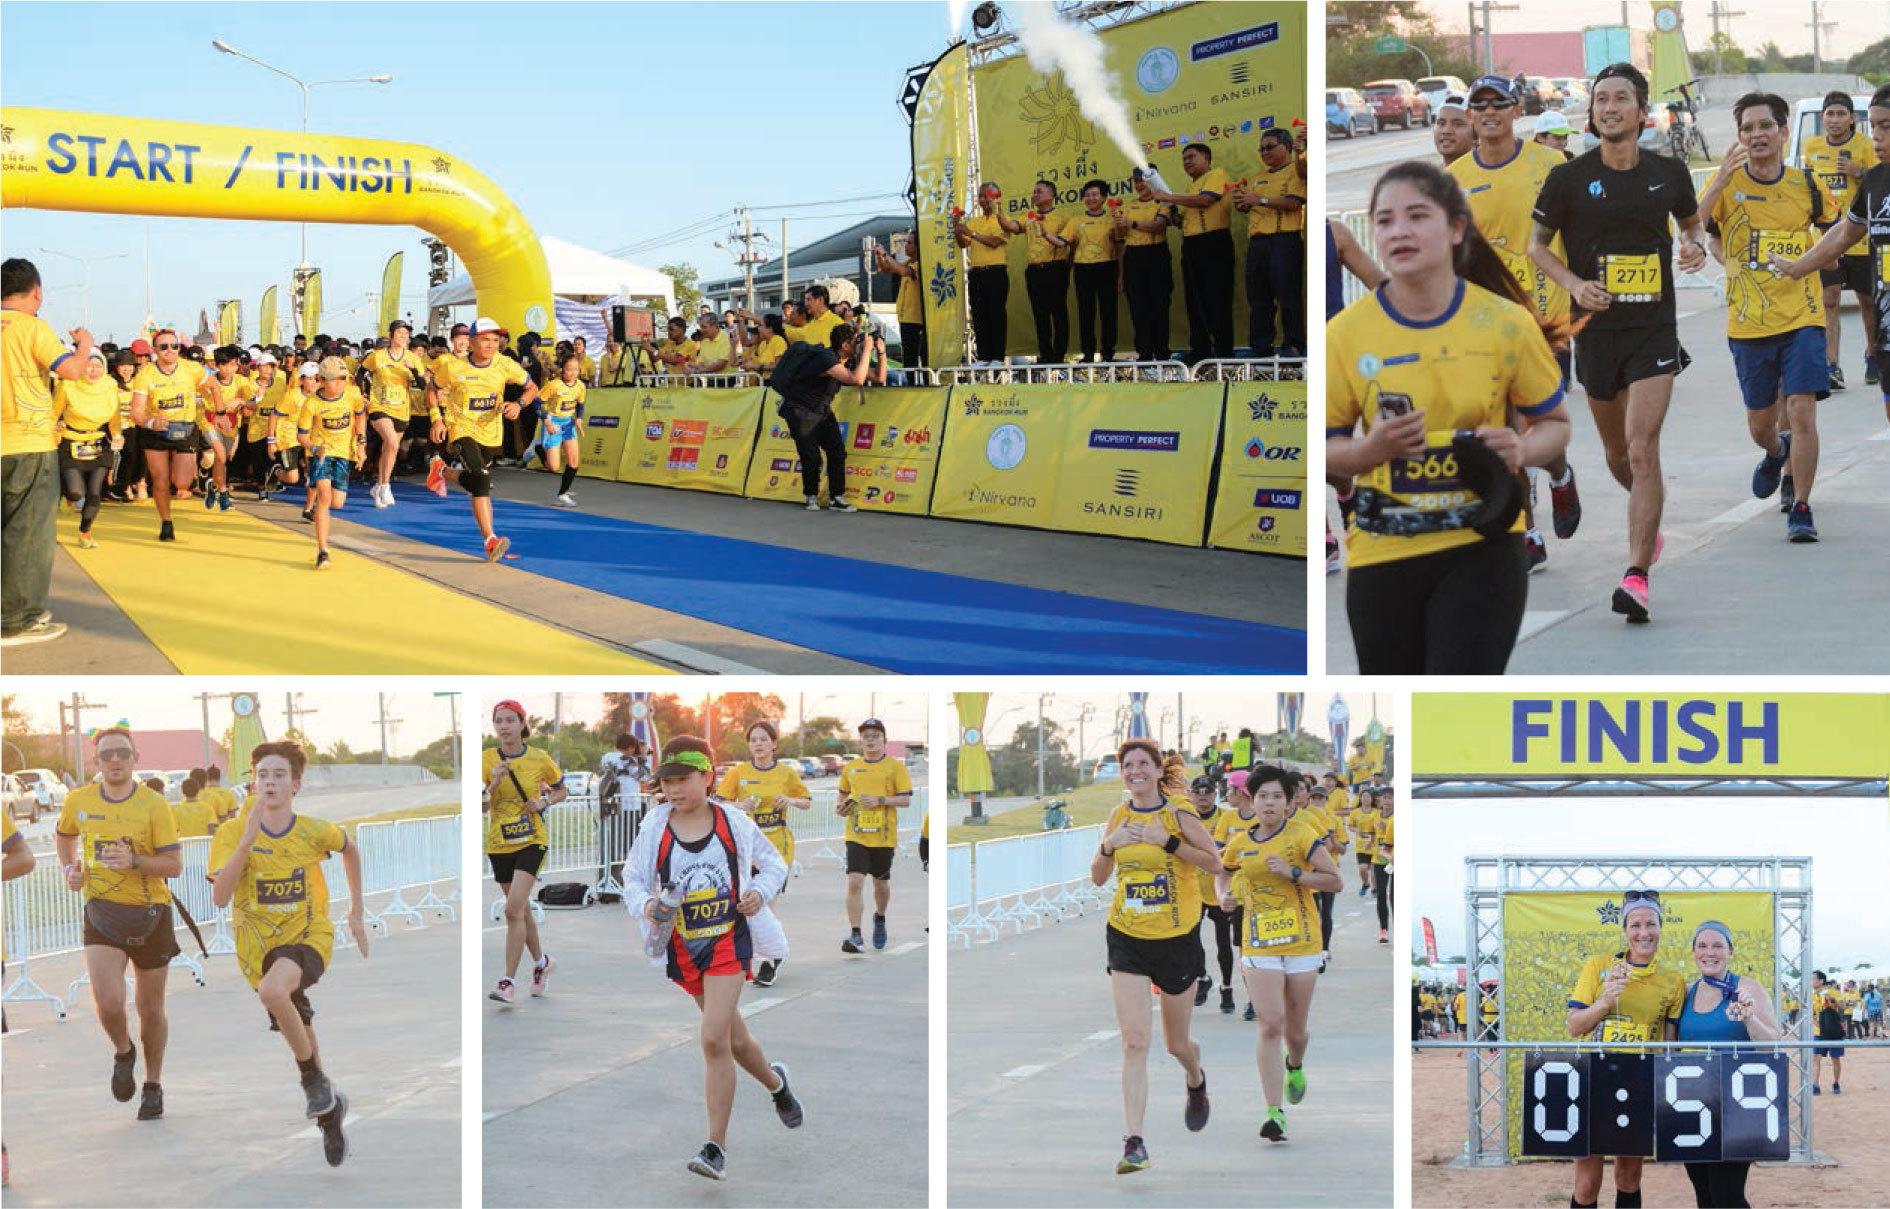 Ruang Phueng Bangkok Run with Toon Bodyslam, Ruamrudee International School Bangkok, Thailand